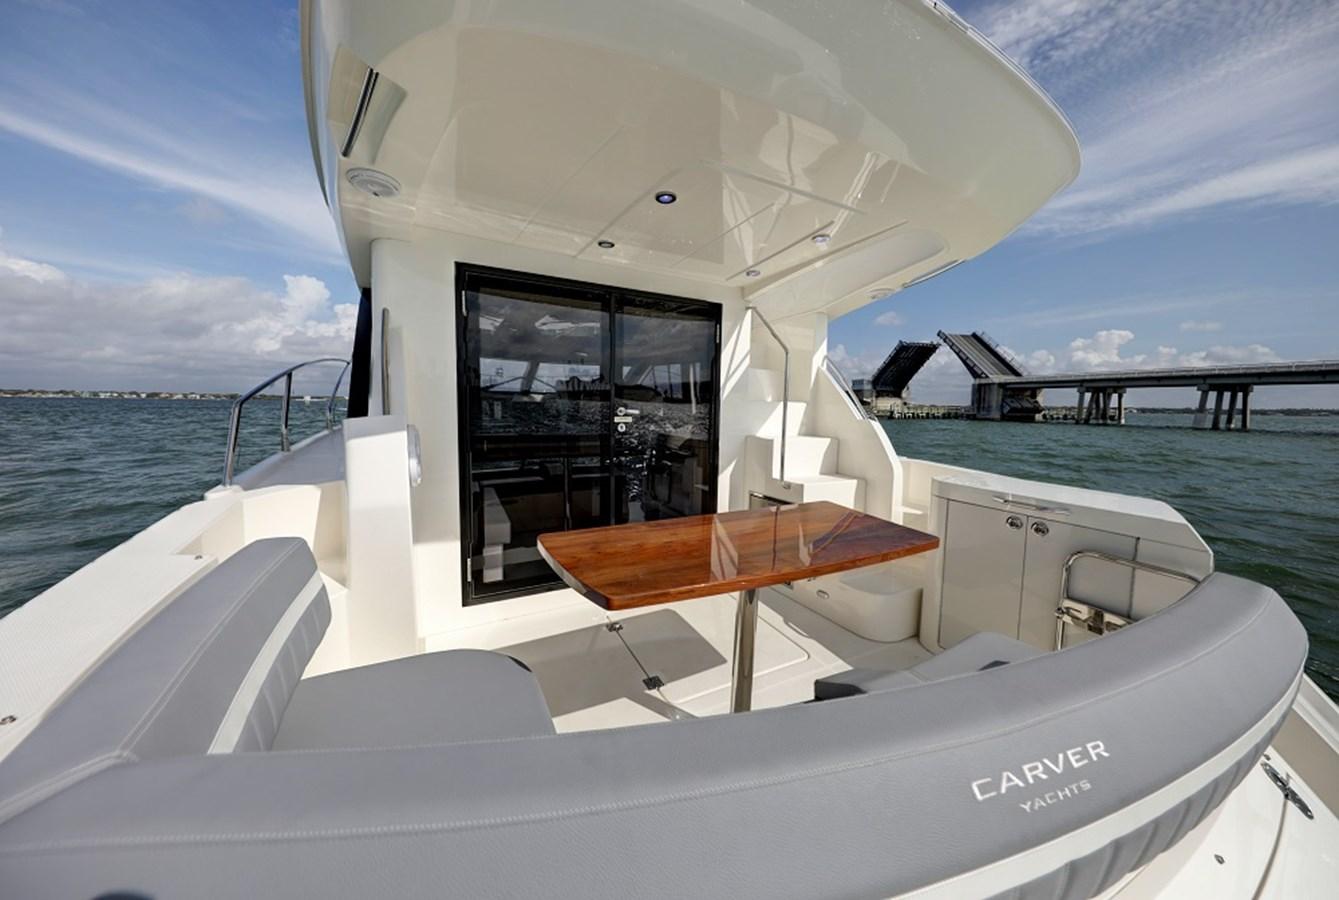 B44A5687_88_89_90_91 2020 CARVER C40 Command Bridge Motor Yacht 2825082